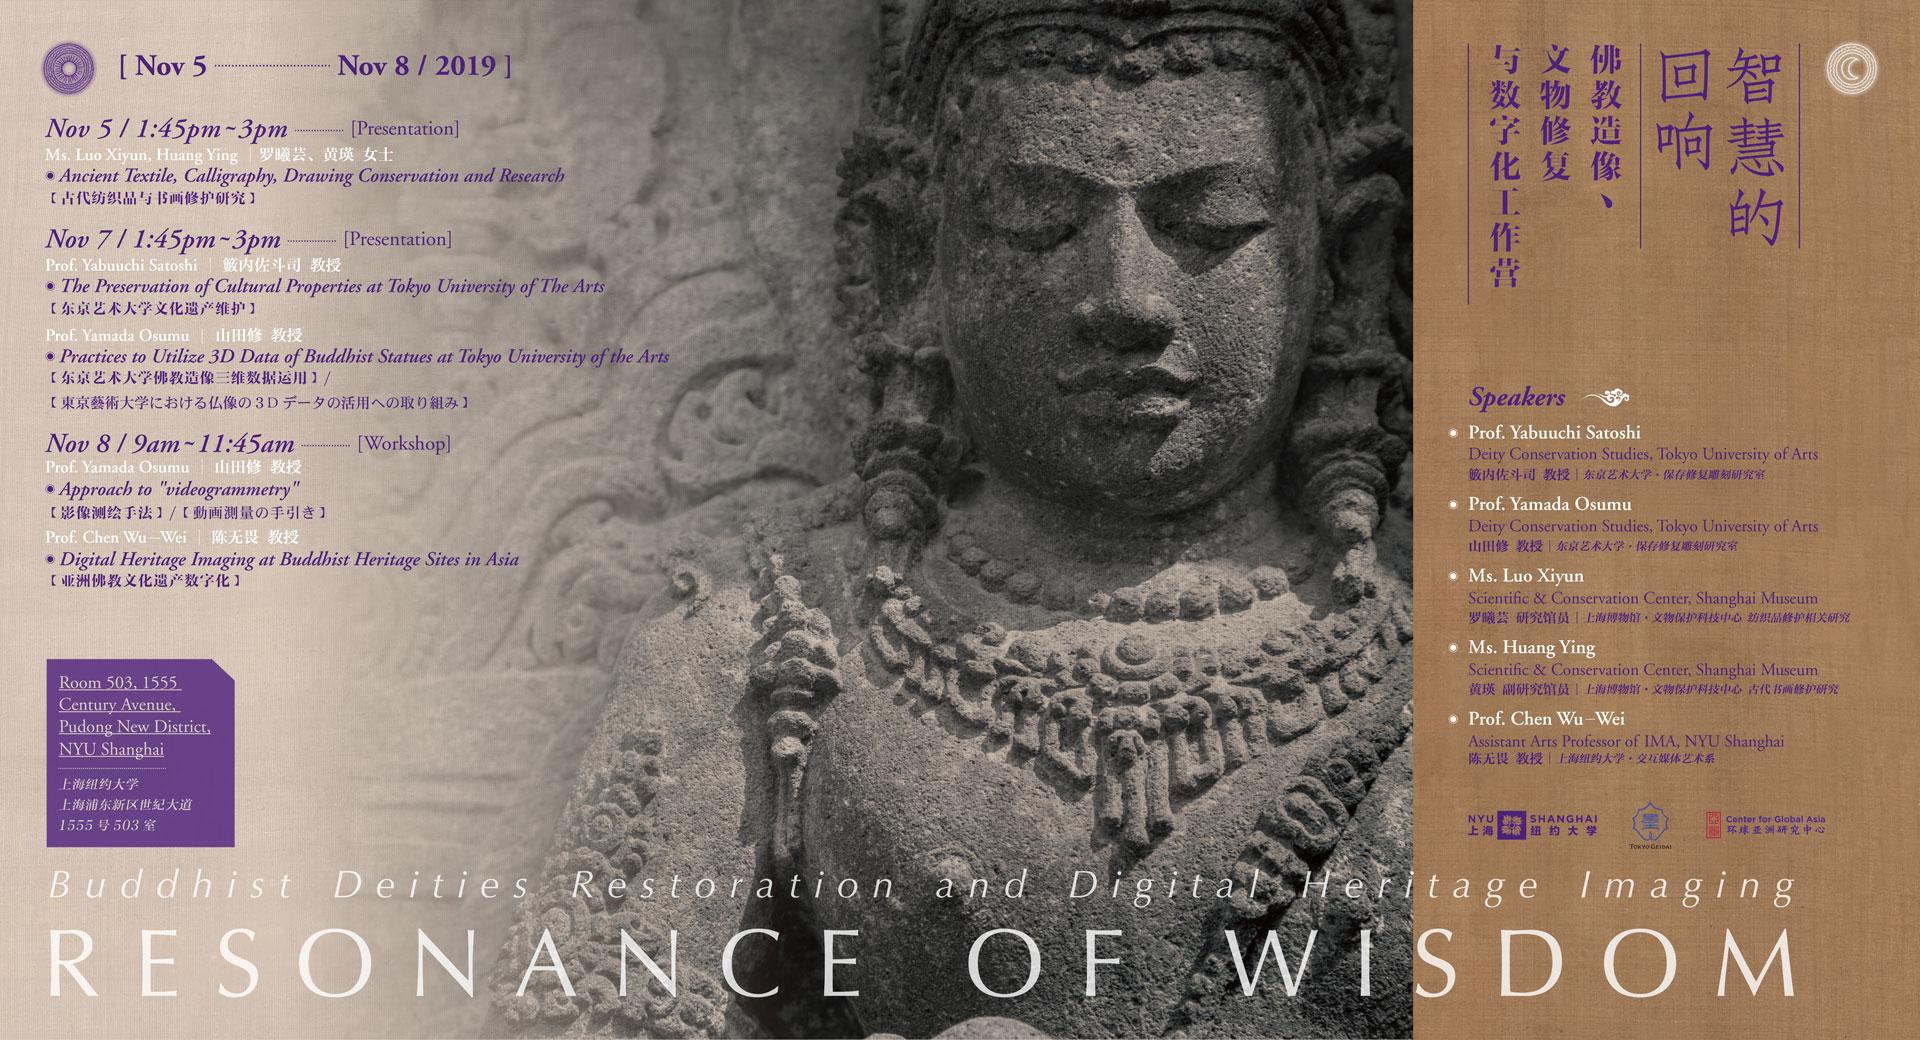 Resonance-of-Wisdom